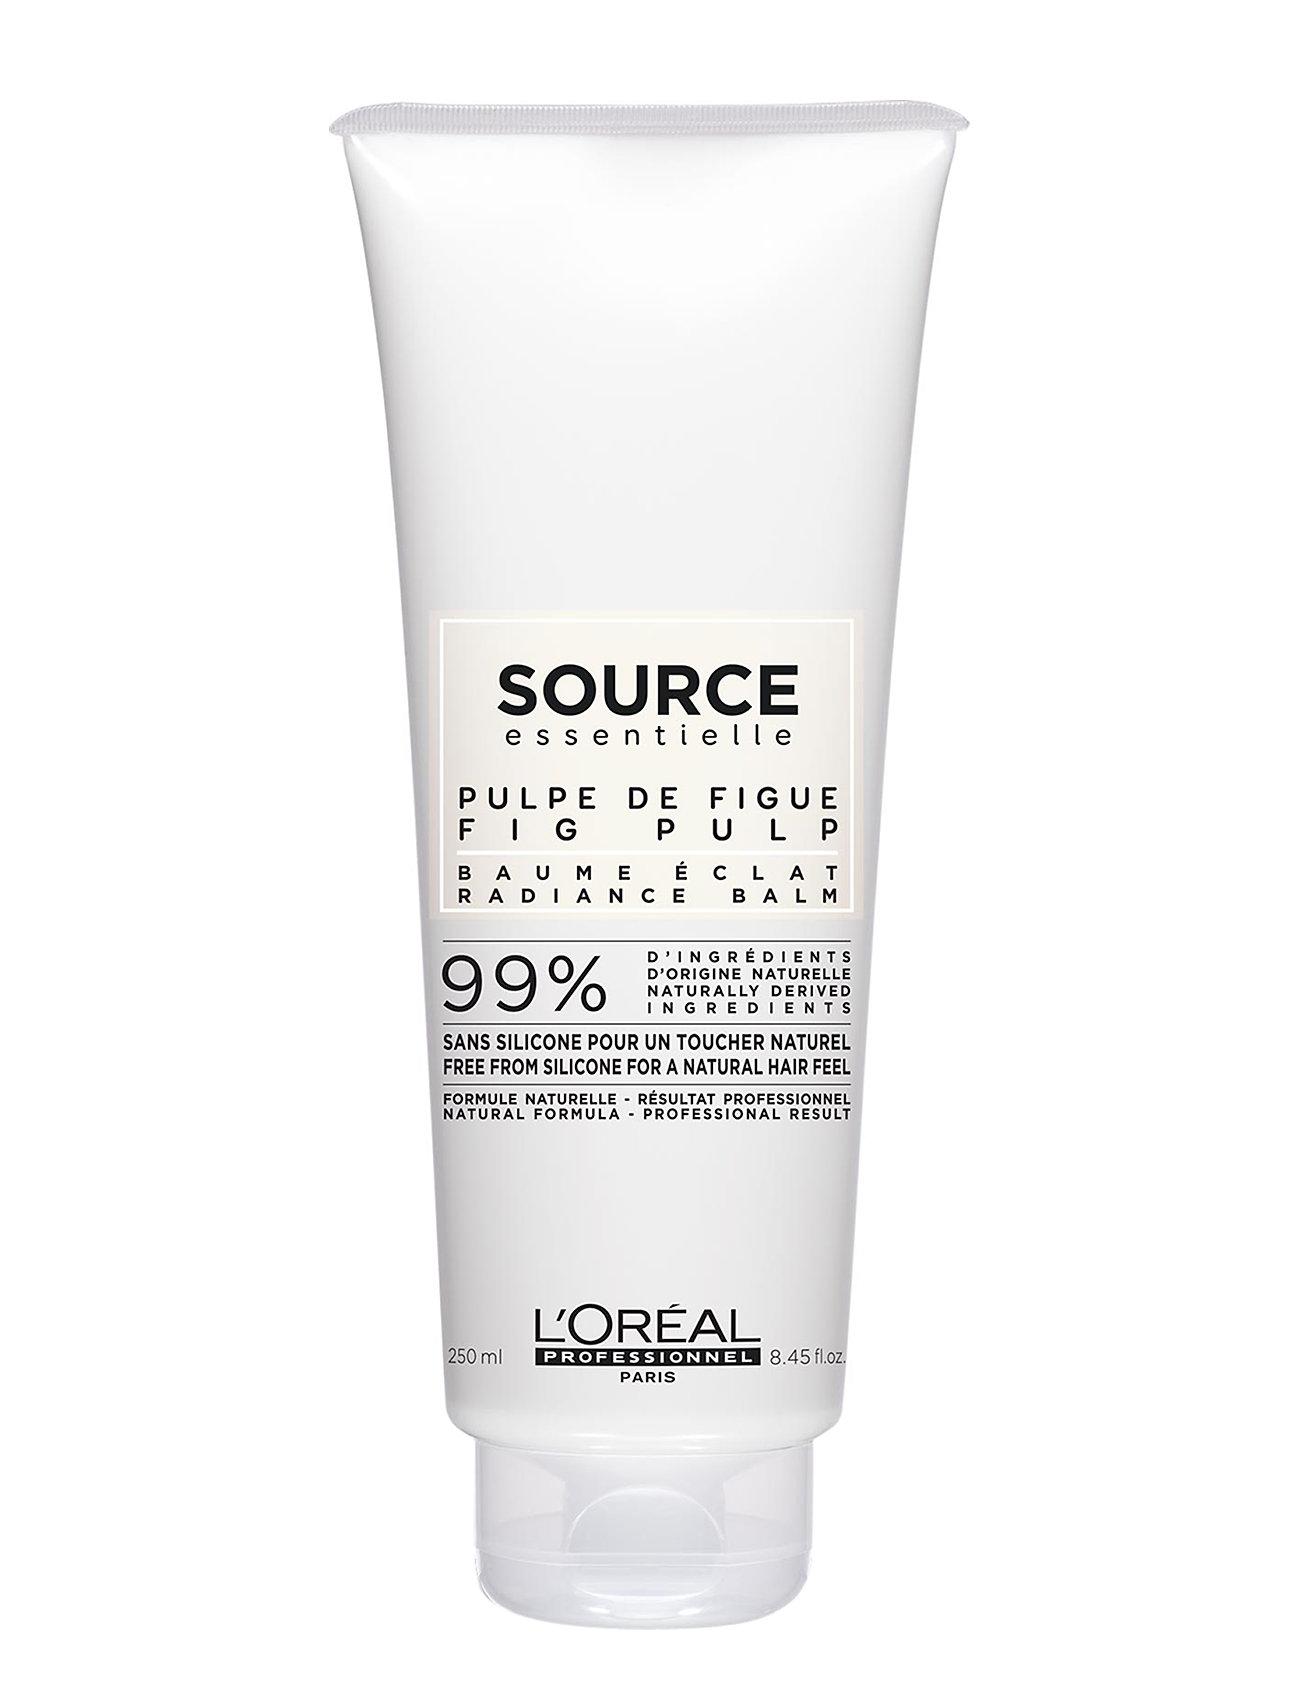 L'Oréal Professionnel L'Oréal Professionnel Source Essentielle Radiance Mask - CLEAR